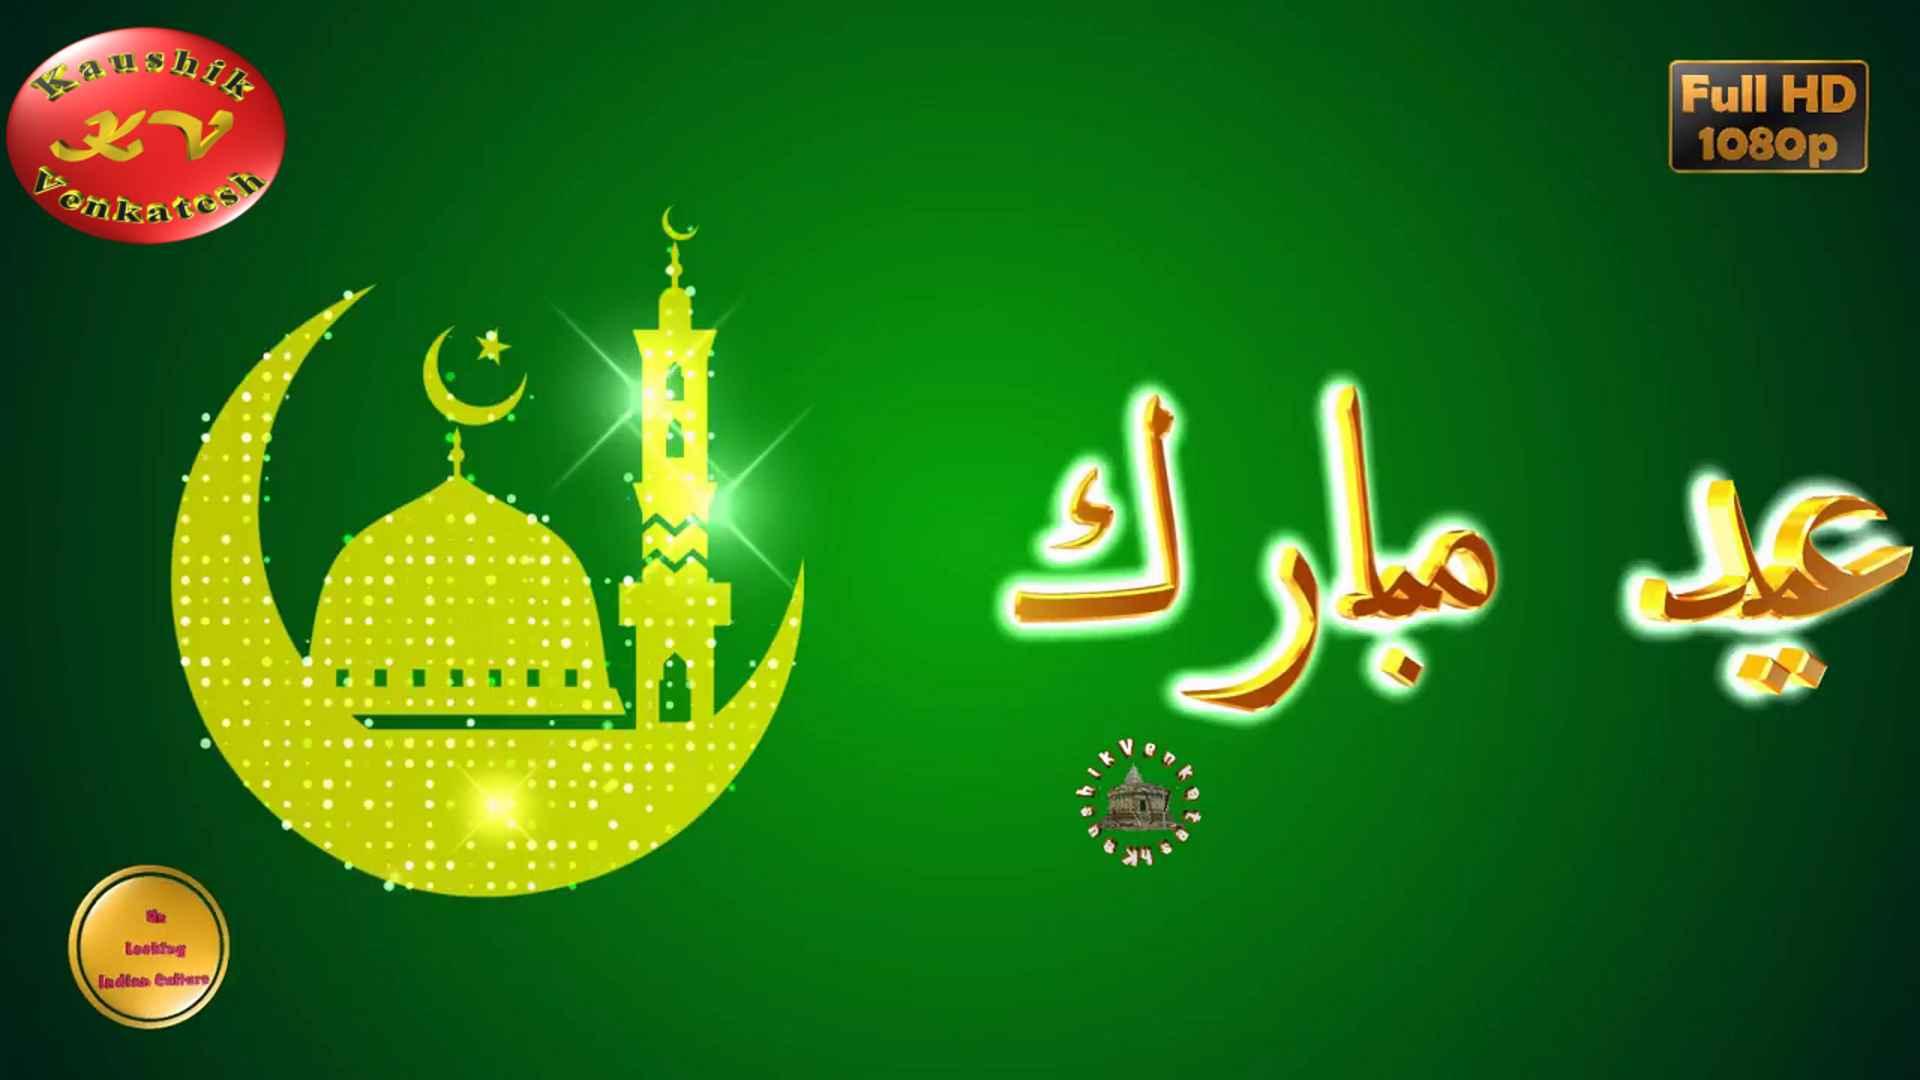 Eid Images HD Download